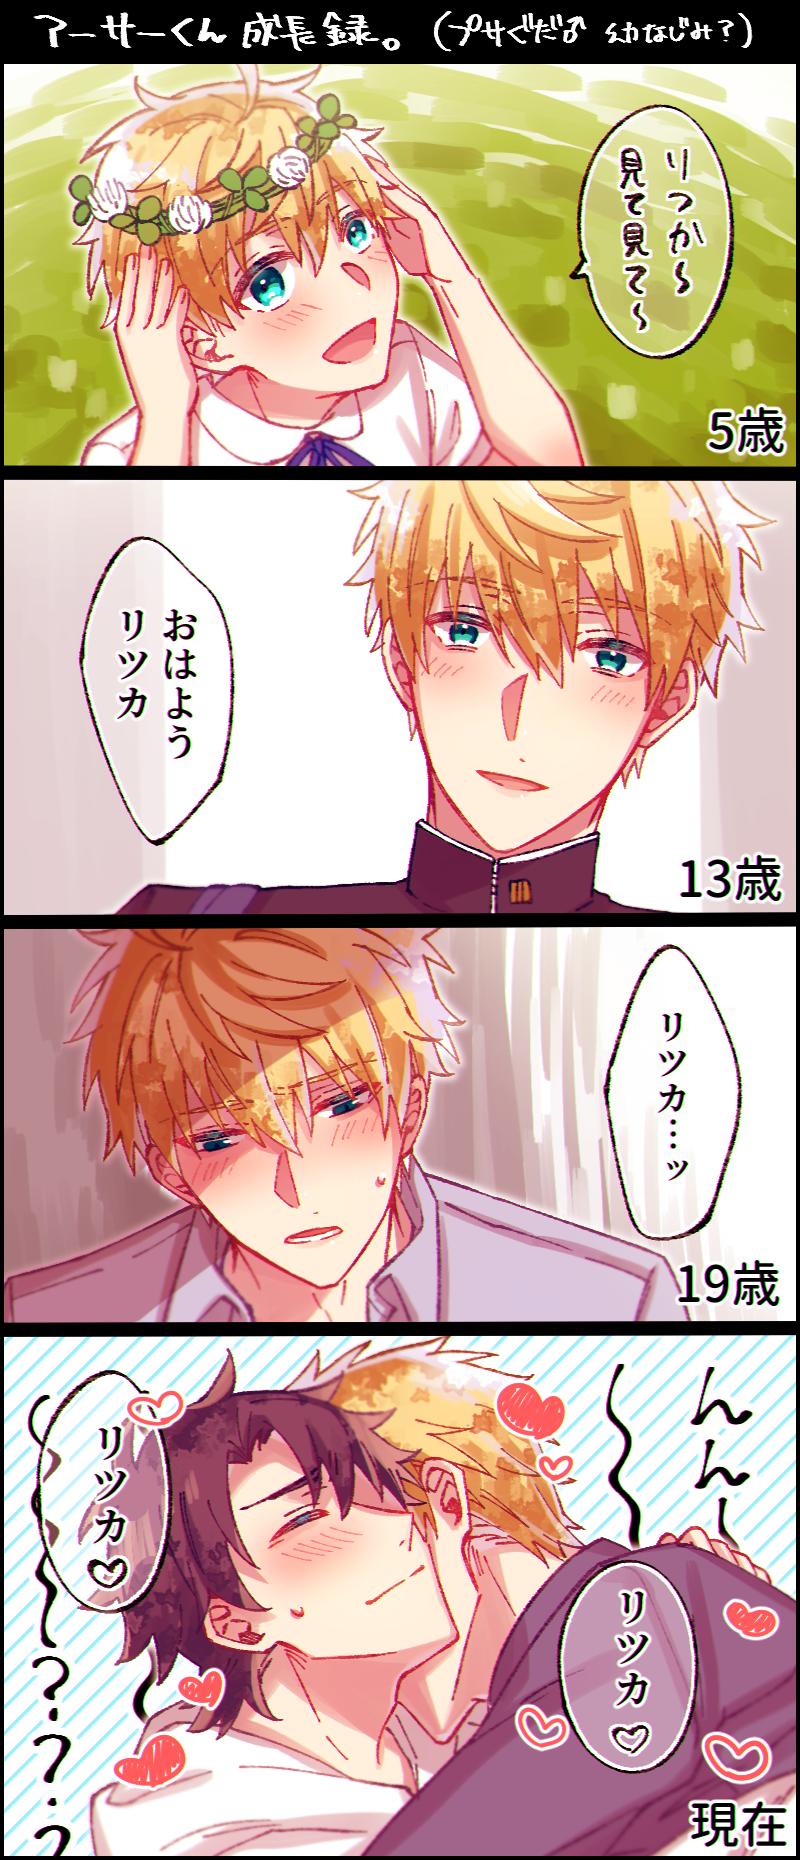 twitter 漫画 マンガ 凪